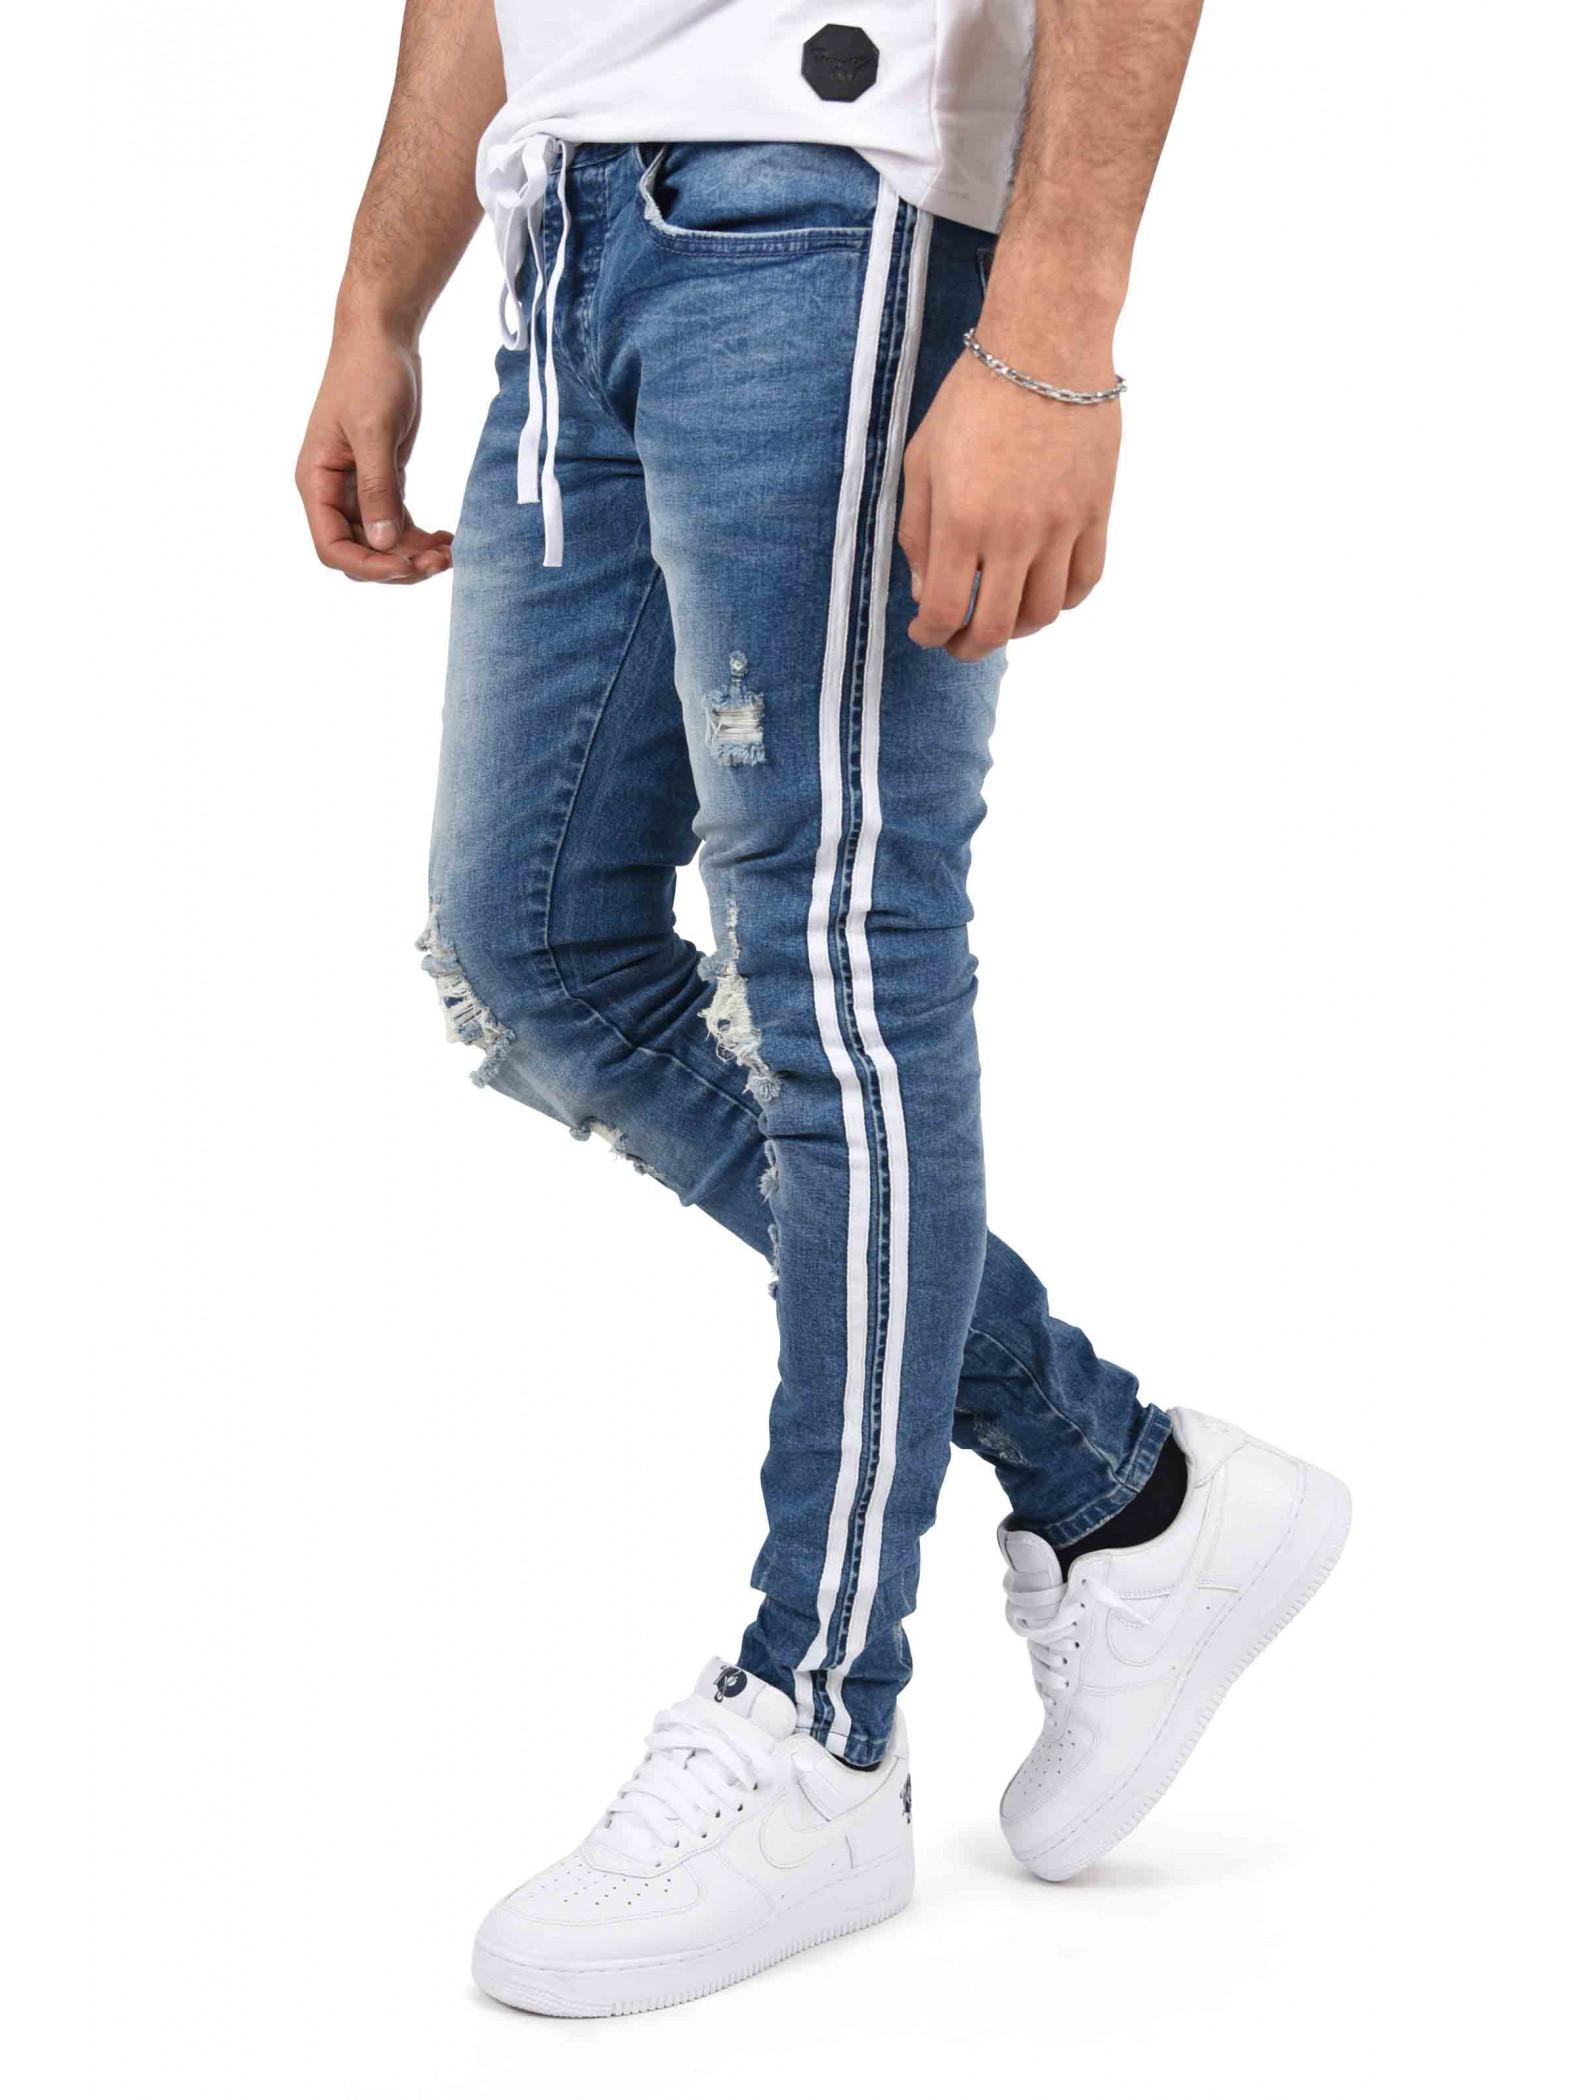 jean skinny destroy ceinture lacet et bandes sur les. Black Bedroom Furniture Sets. Home Design Ideas